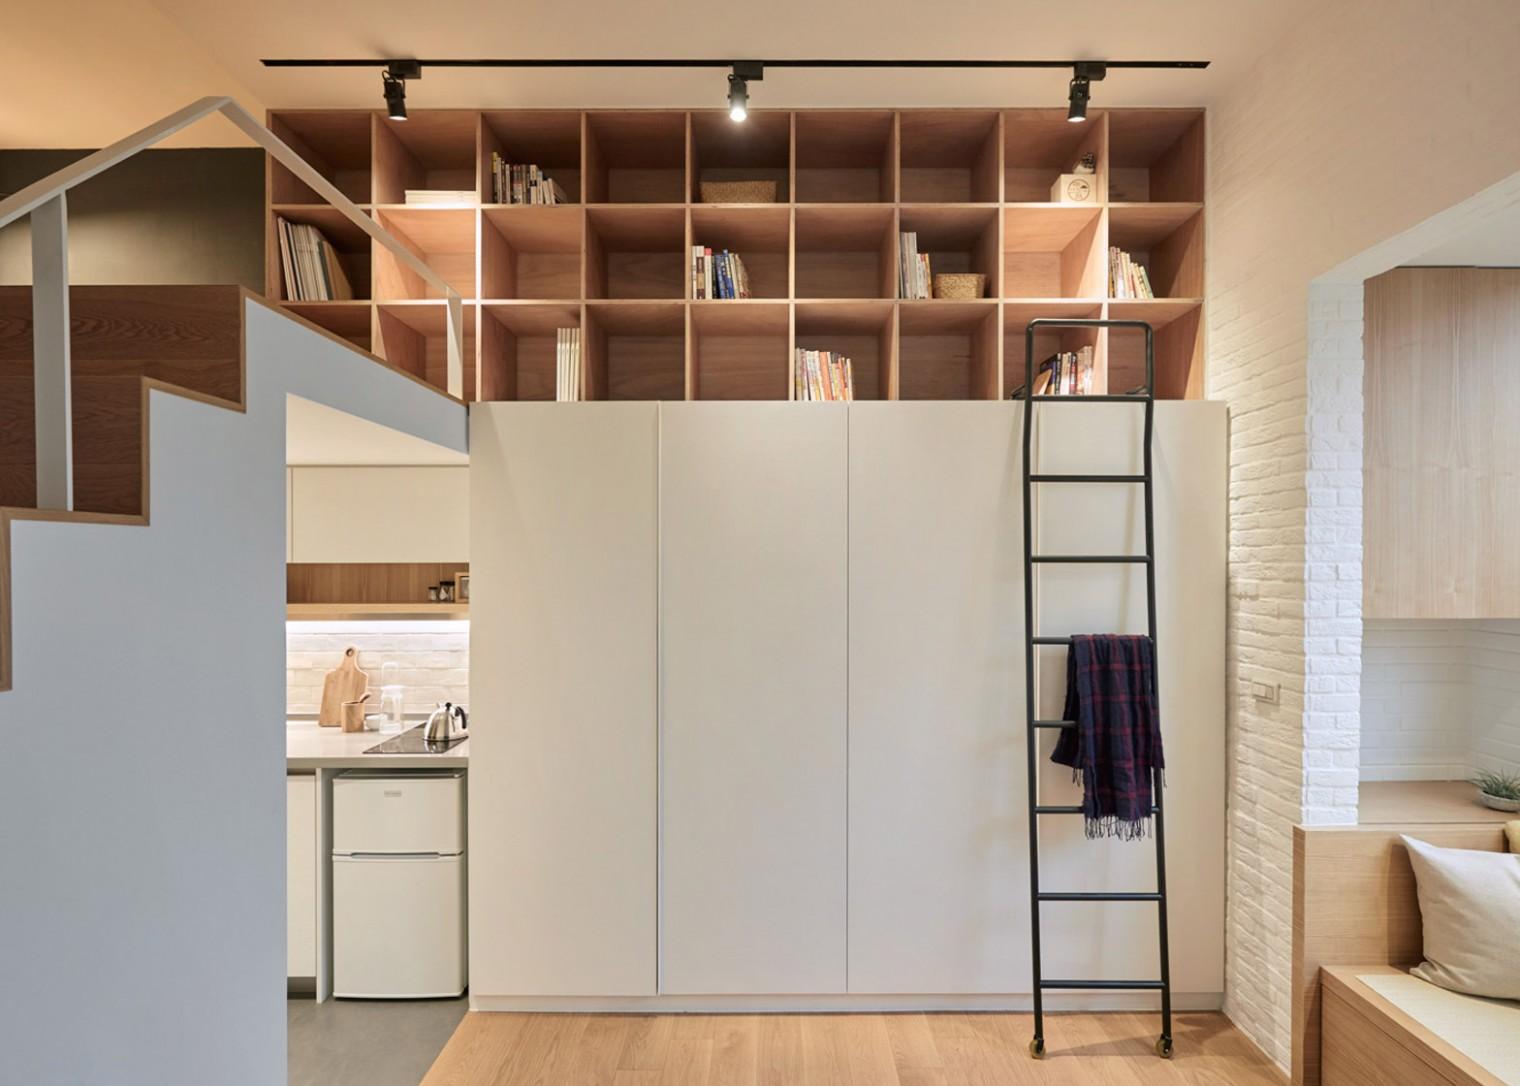 A Little Design creates 112m12 apartment in Taiwan - Apartment Unit Design